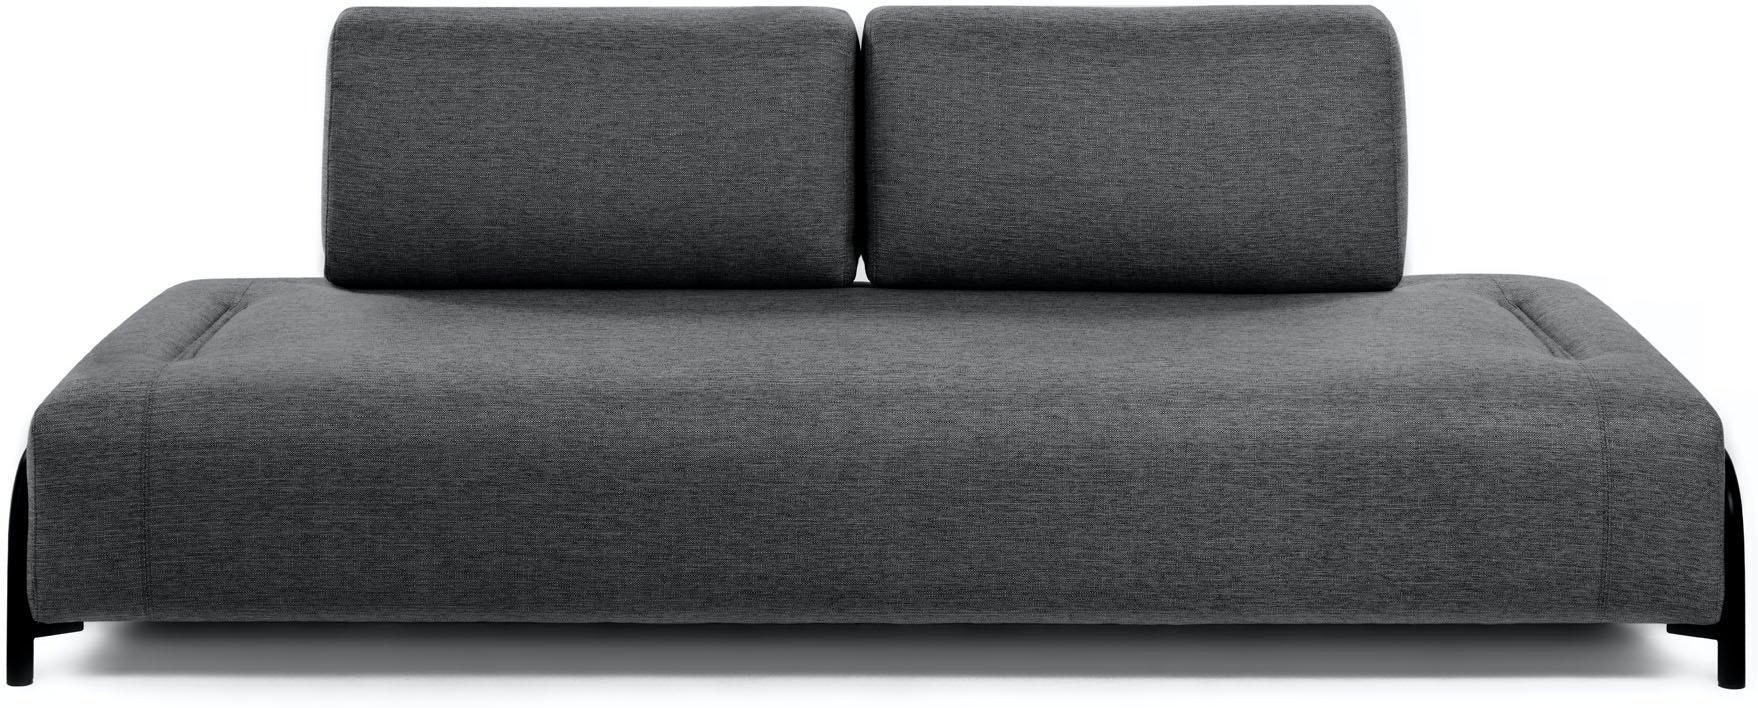 Compo, 3-personers sofa by LaForma (Uden armlæn, Sort)